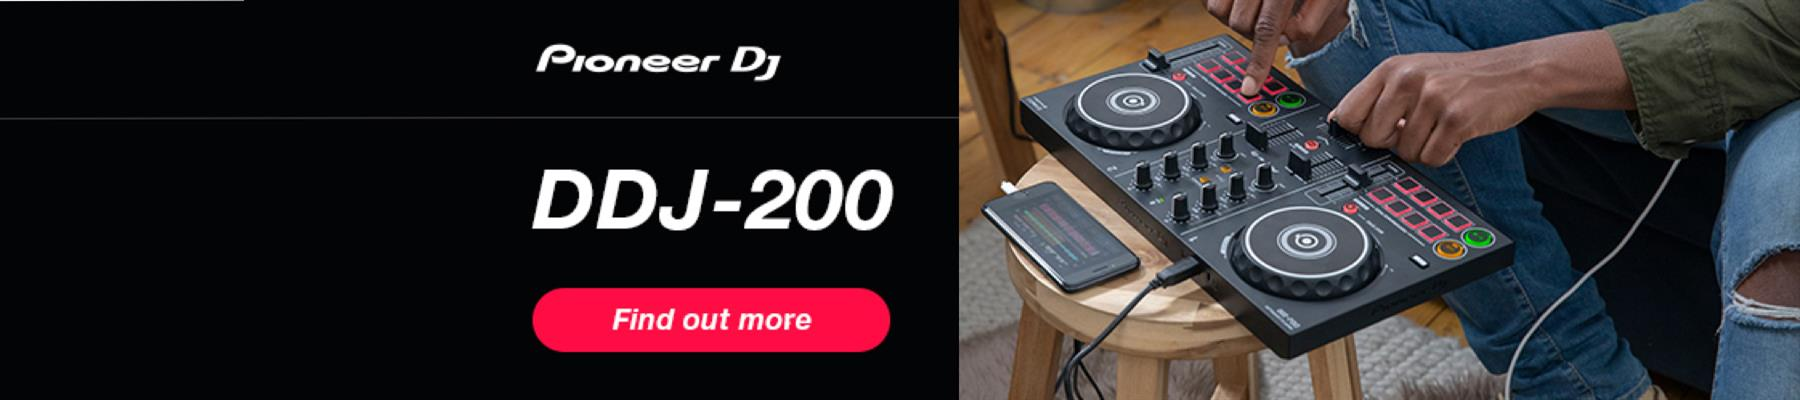 Pioneer DDJ200 Beginner Controller